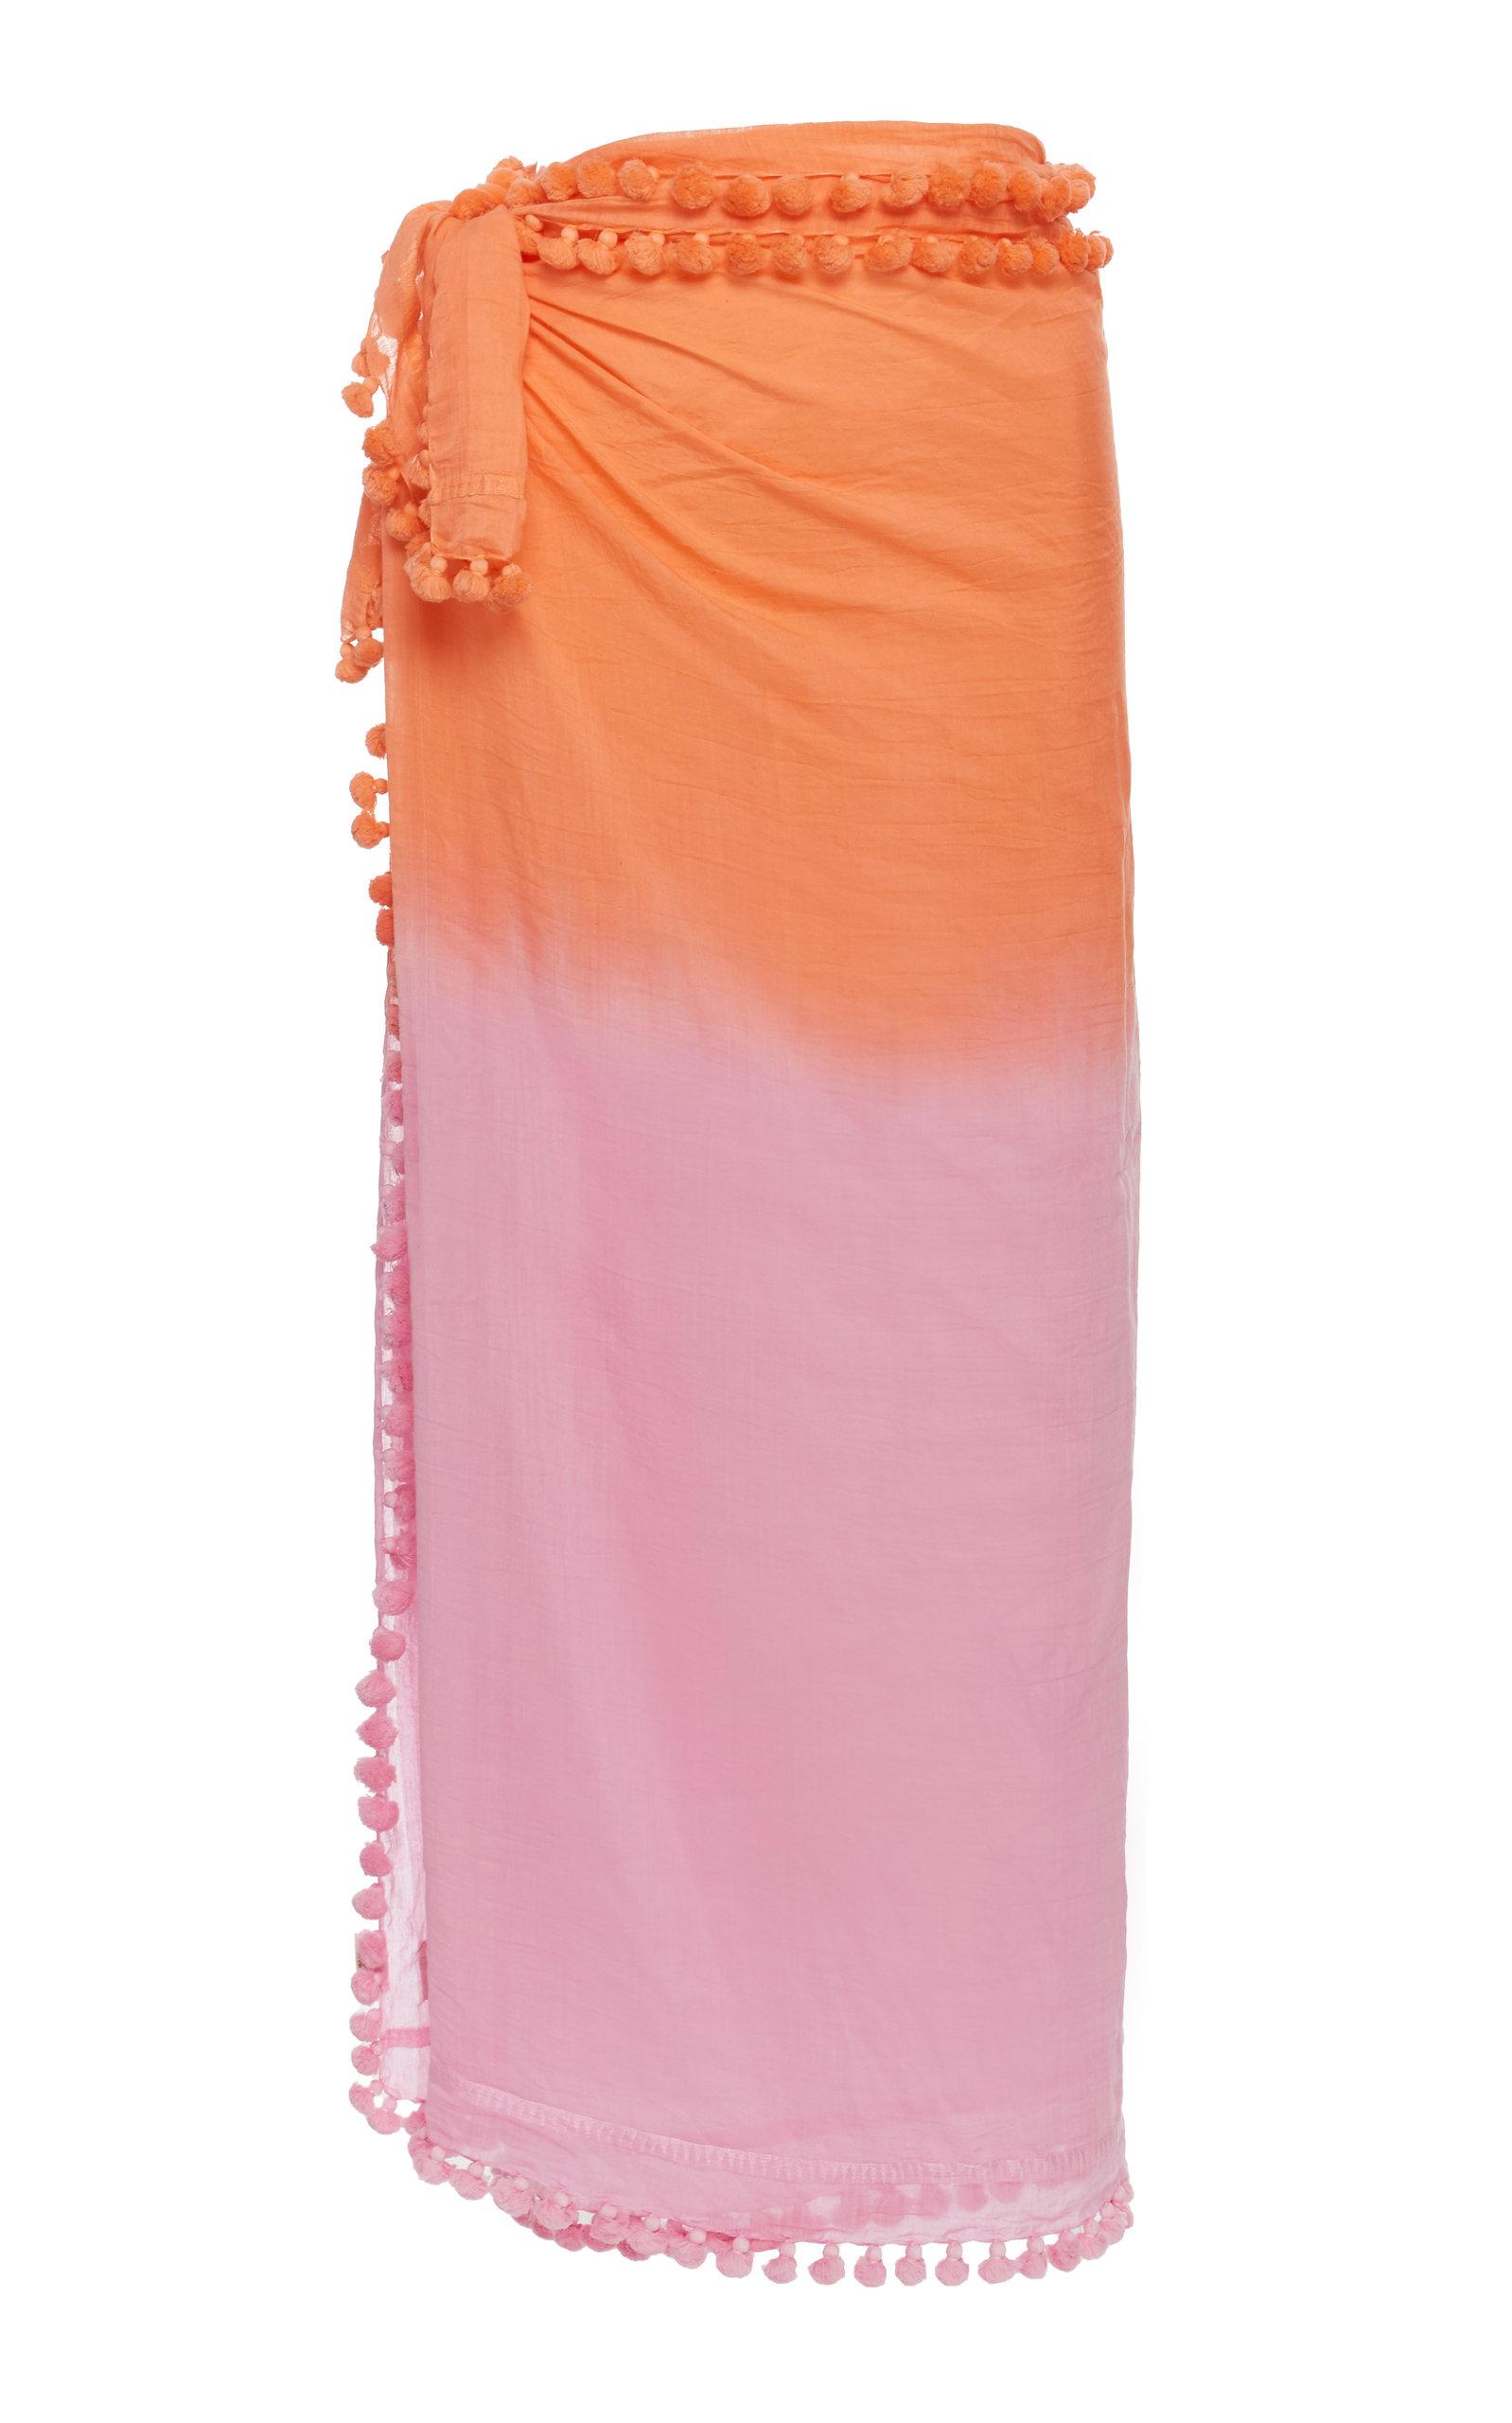 MATTA Dupatta Ombré Cotton And Silk Shawl in Orange